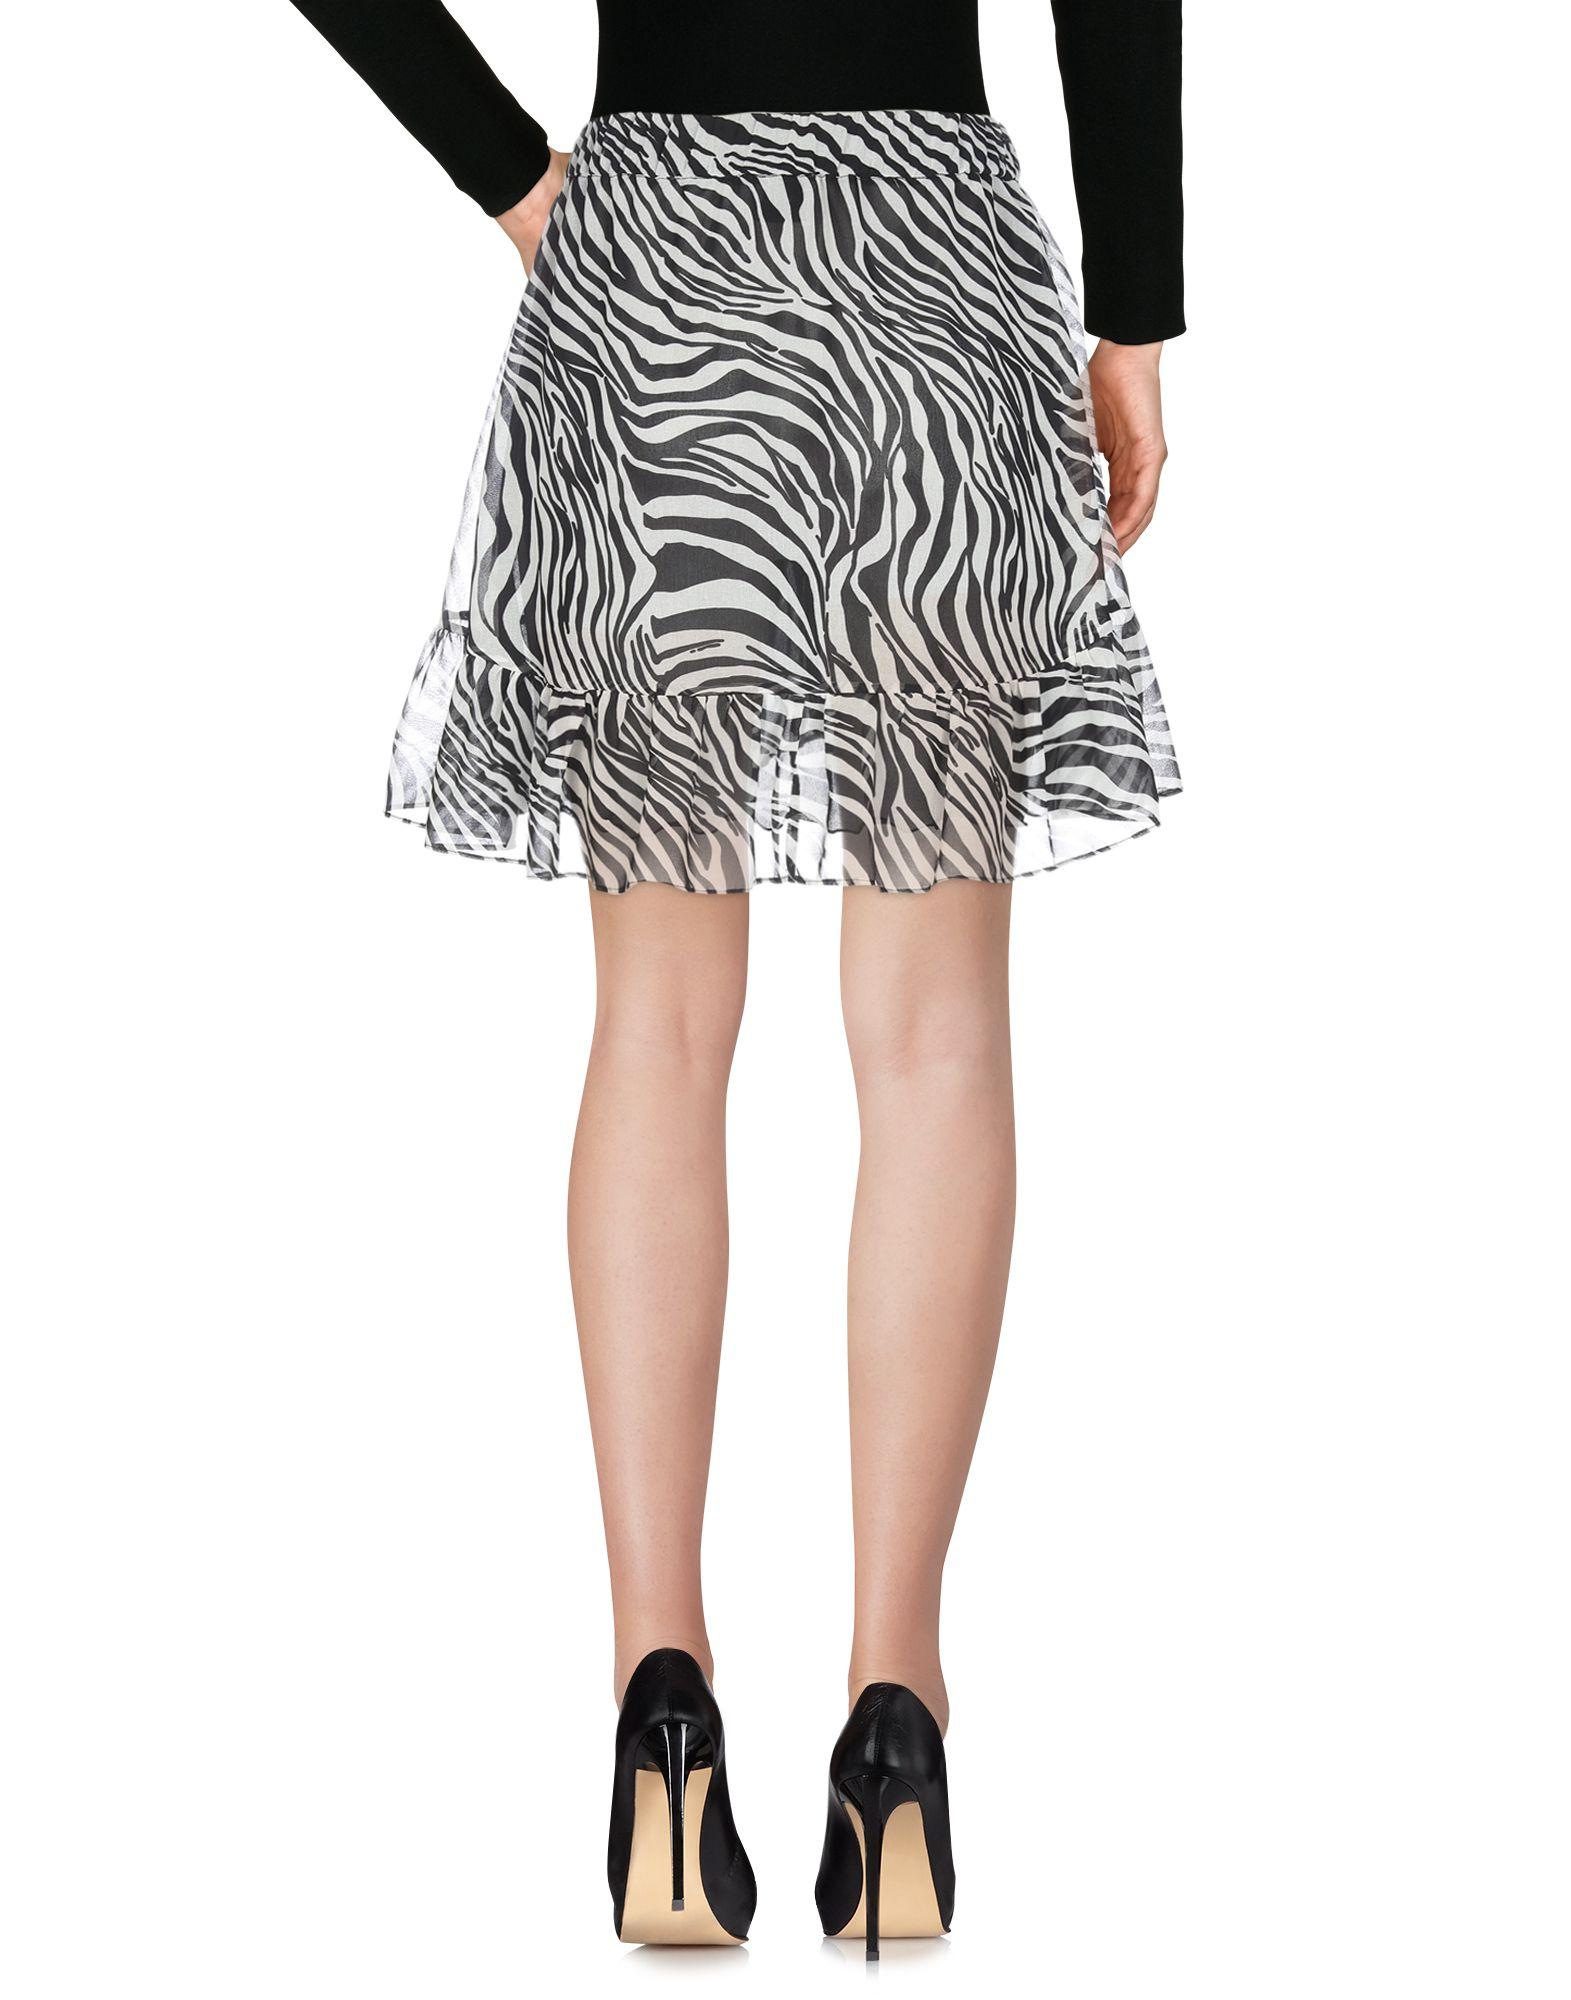 cc8fc1ba4 Minifaldas - Faldas - Rebajas | Buyviu.com